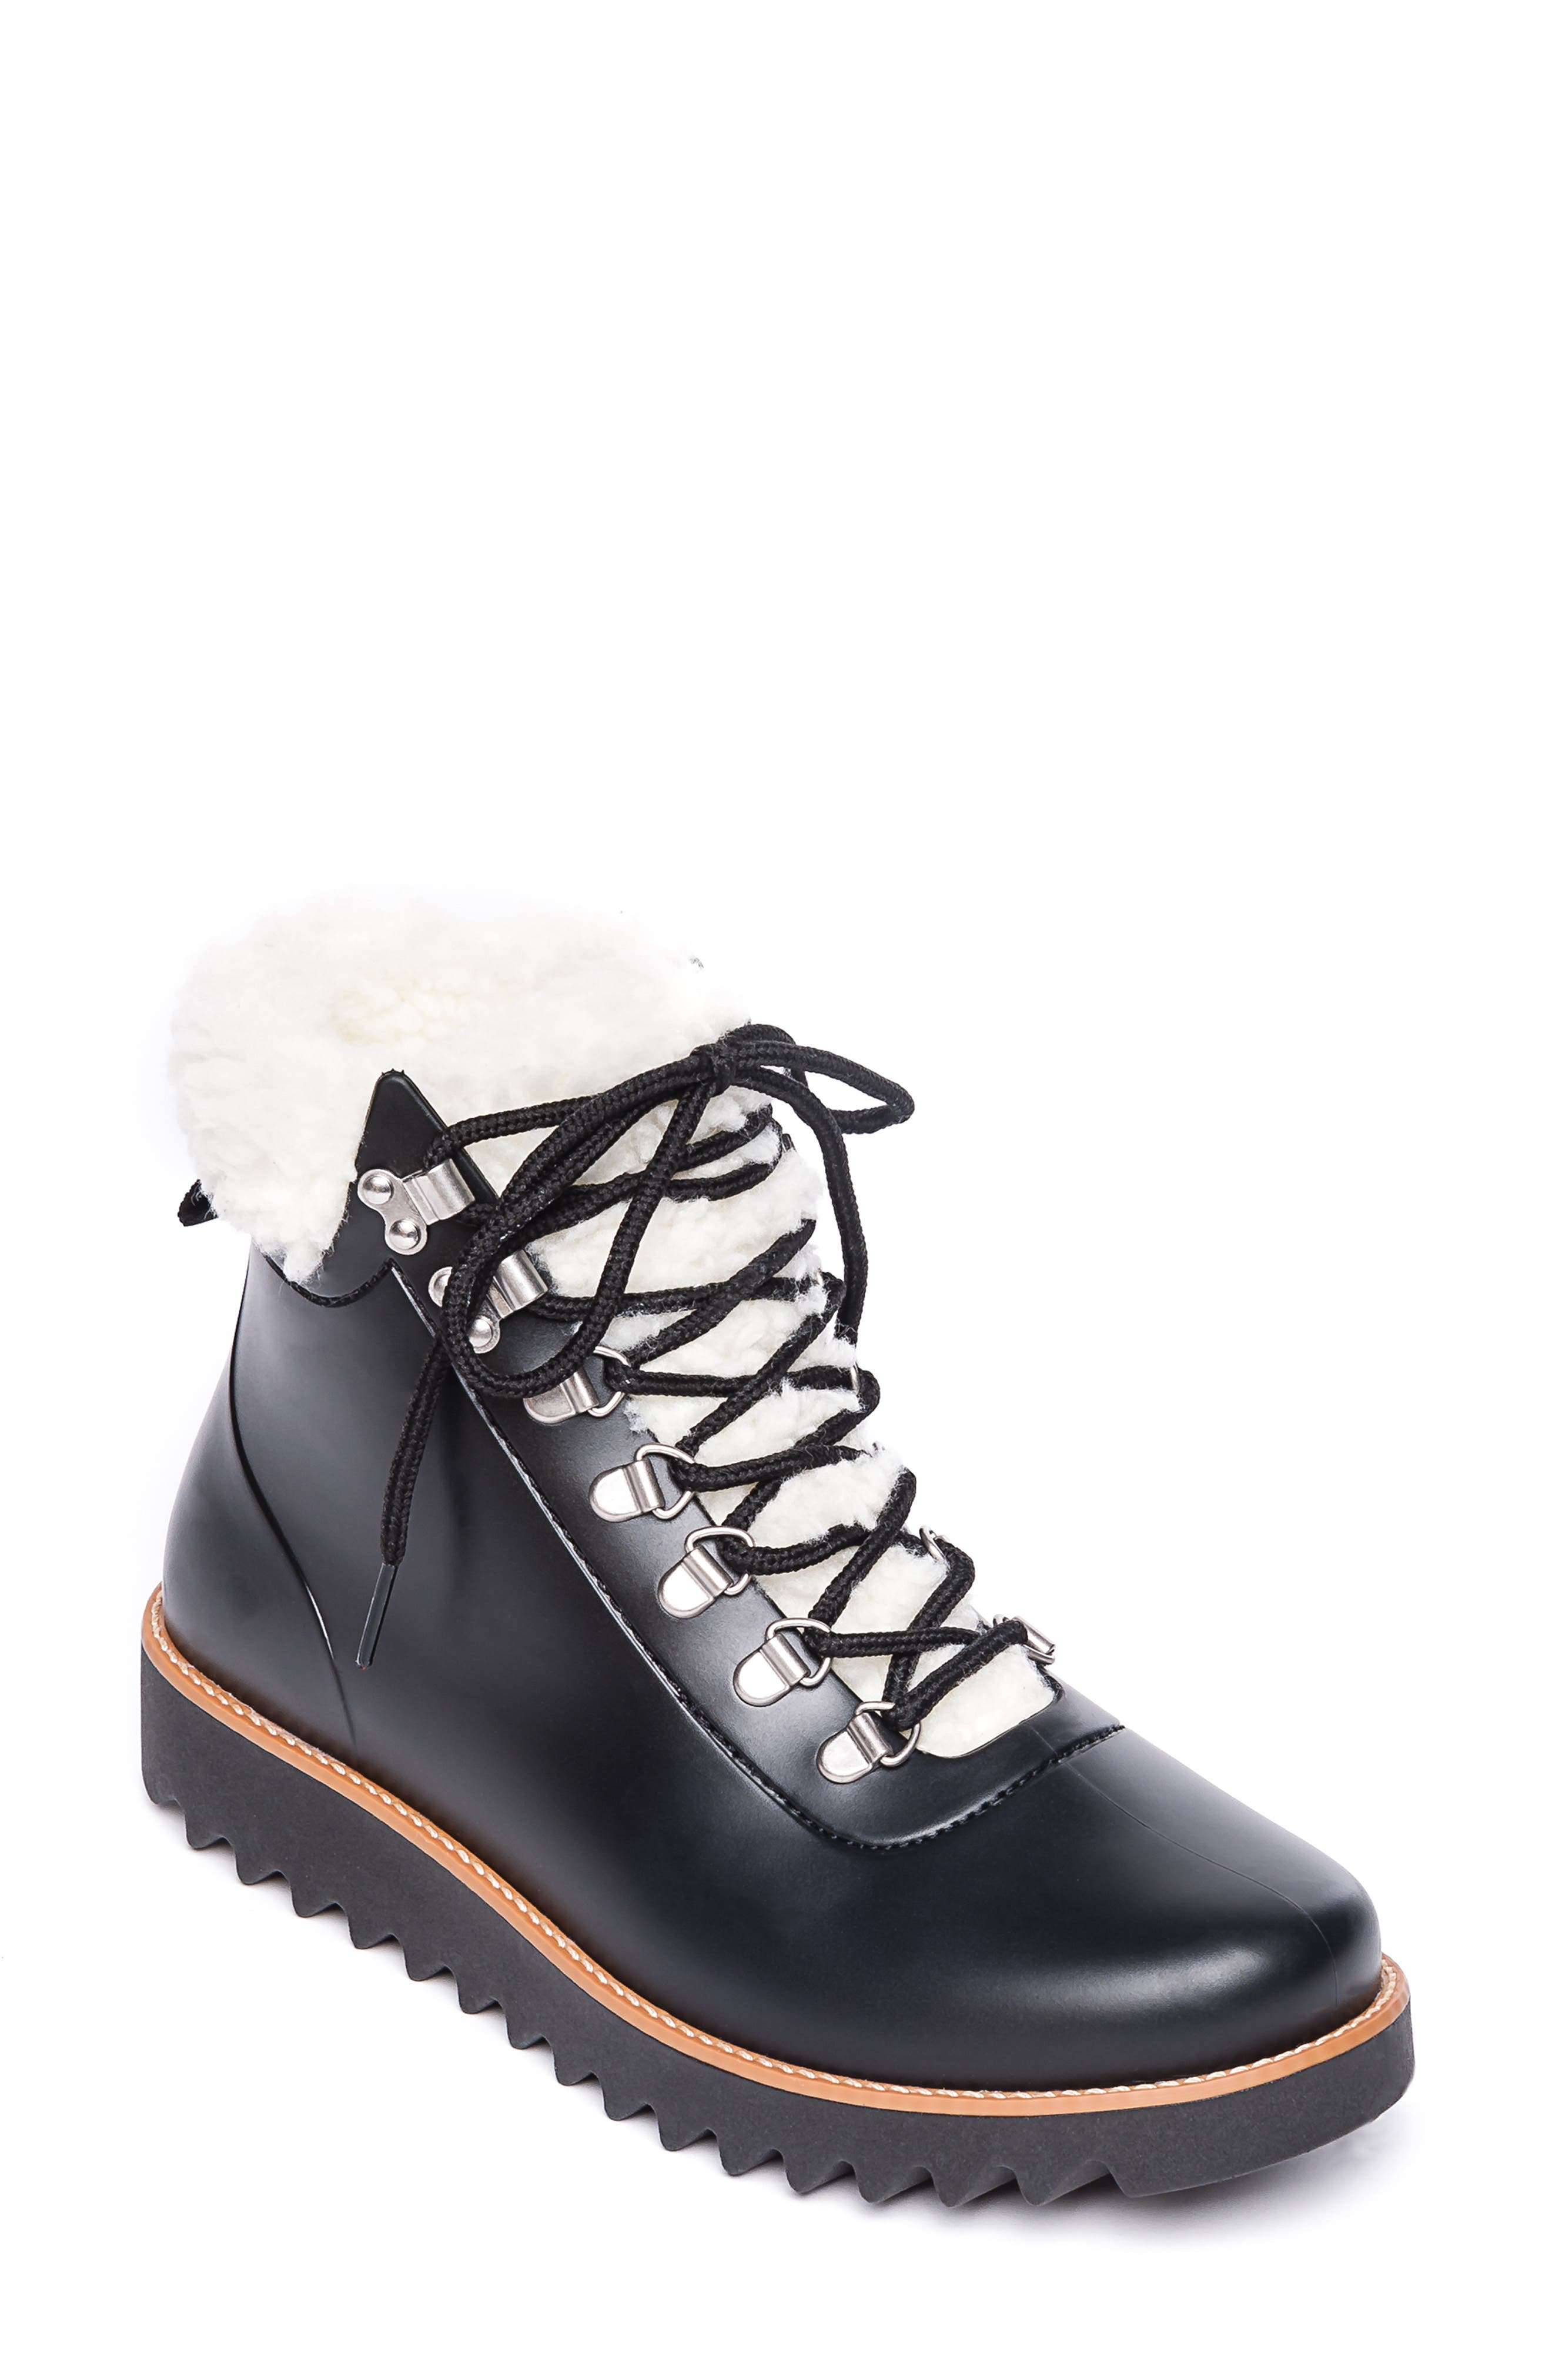 Wiley Waterproof Rain Boot